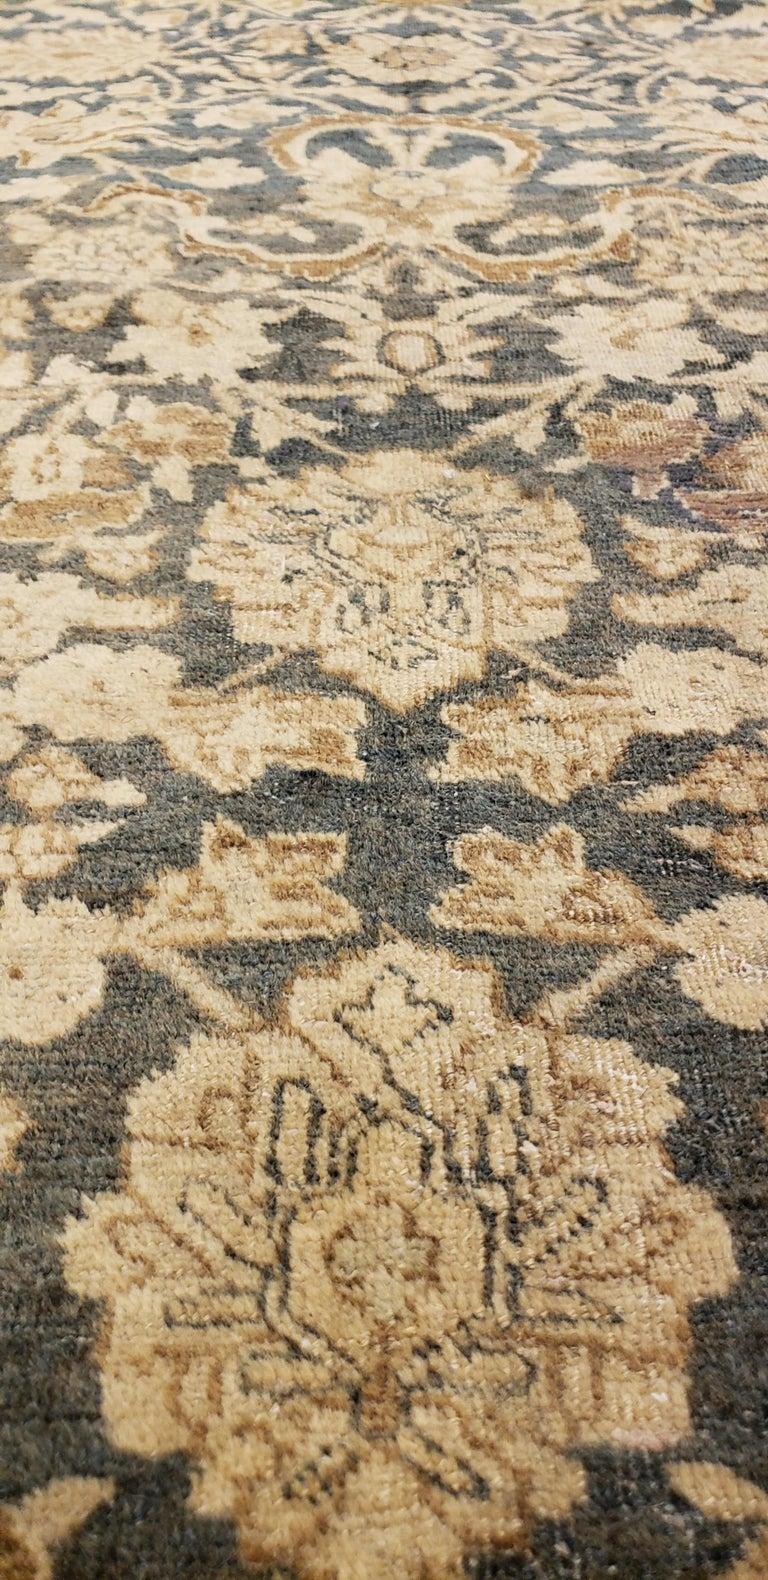 20th Century Antique Persian Tabriz Carpet, Handmade Oriental Rug, Beige, Gray/Blue, Taupe For Sale